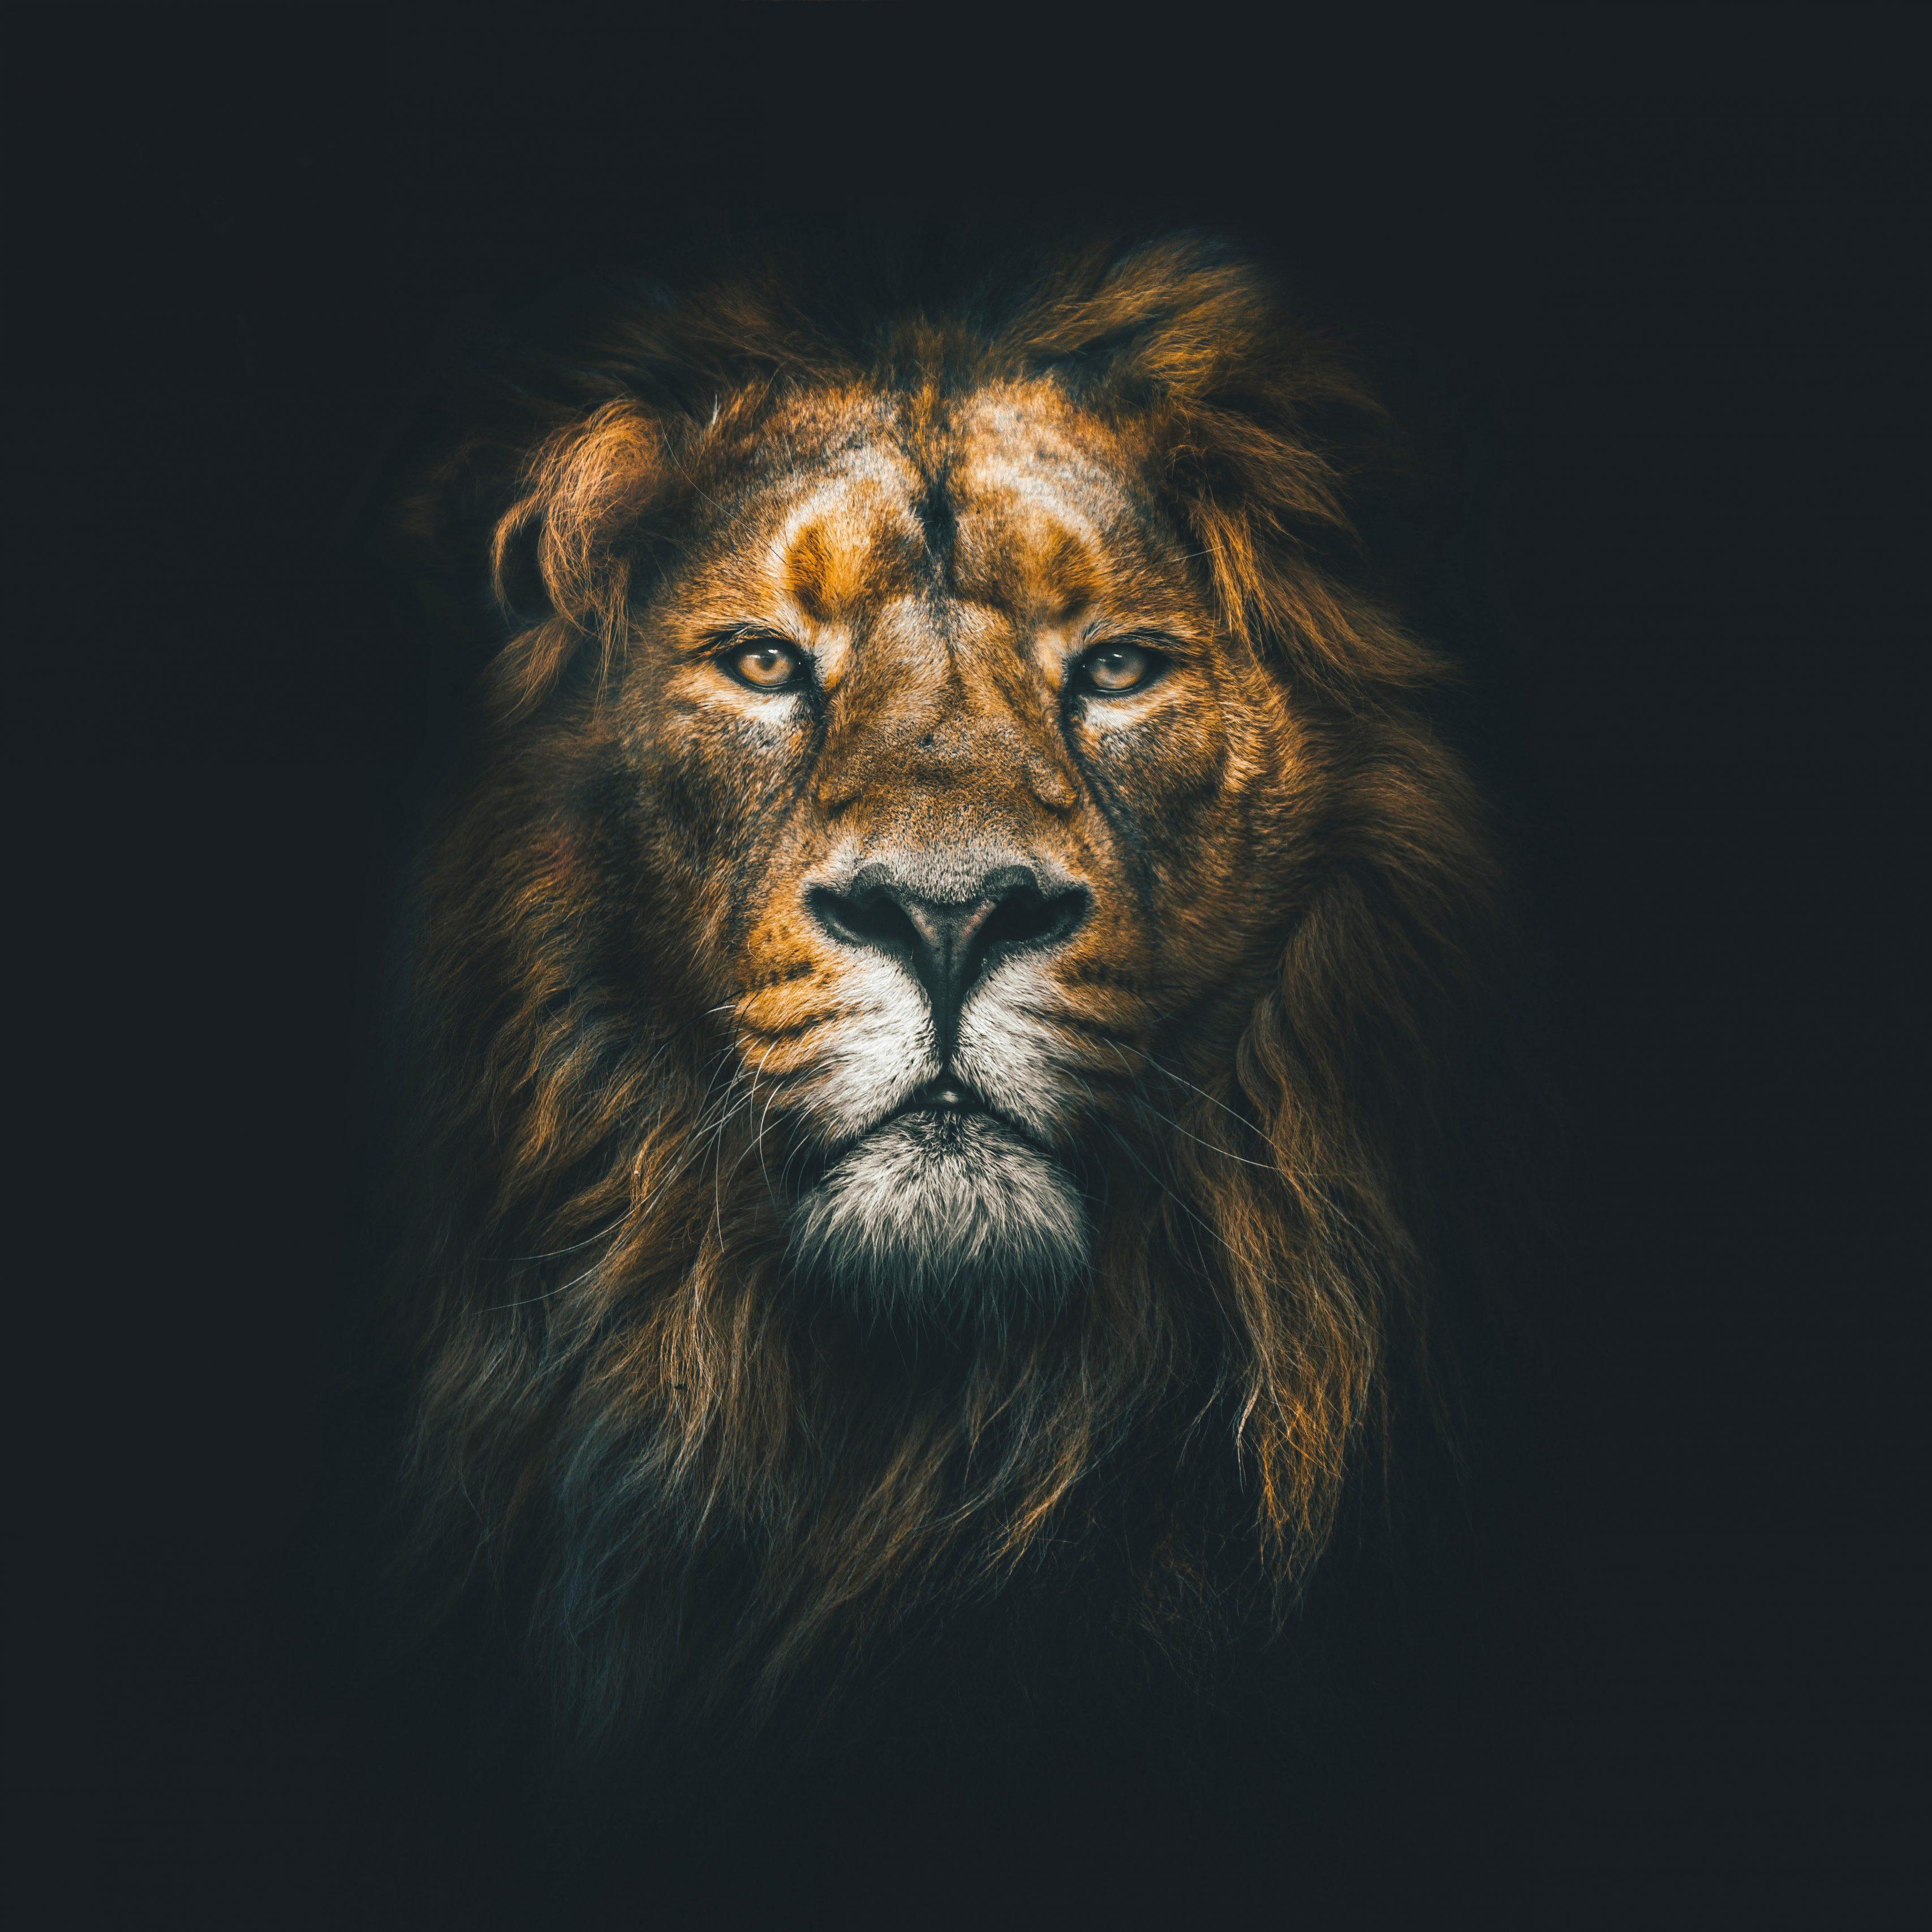 Lion Face Closeup Wild Animal Wildlife 8K Wallpaper